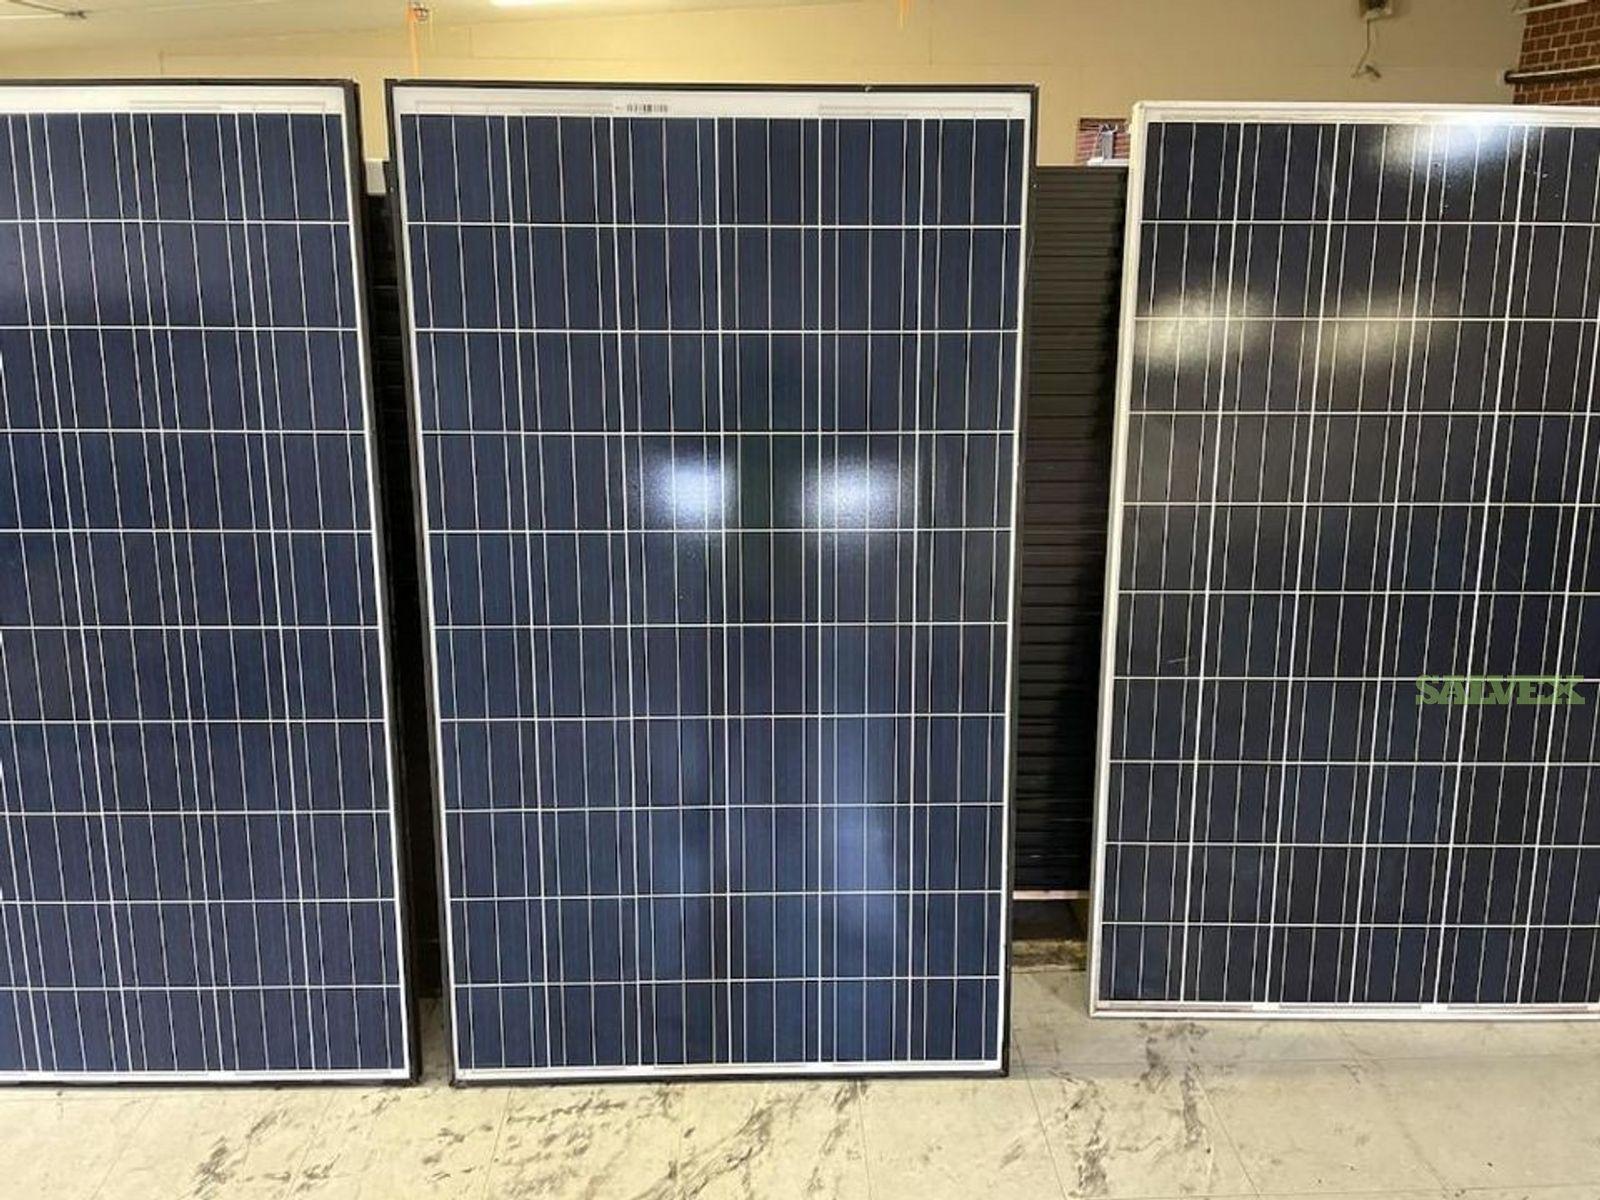 Canadian Solar 255W Solar Panels - Used (100 Panels)